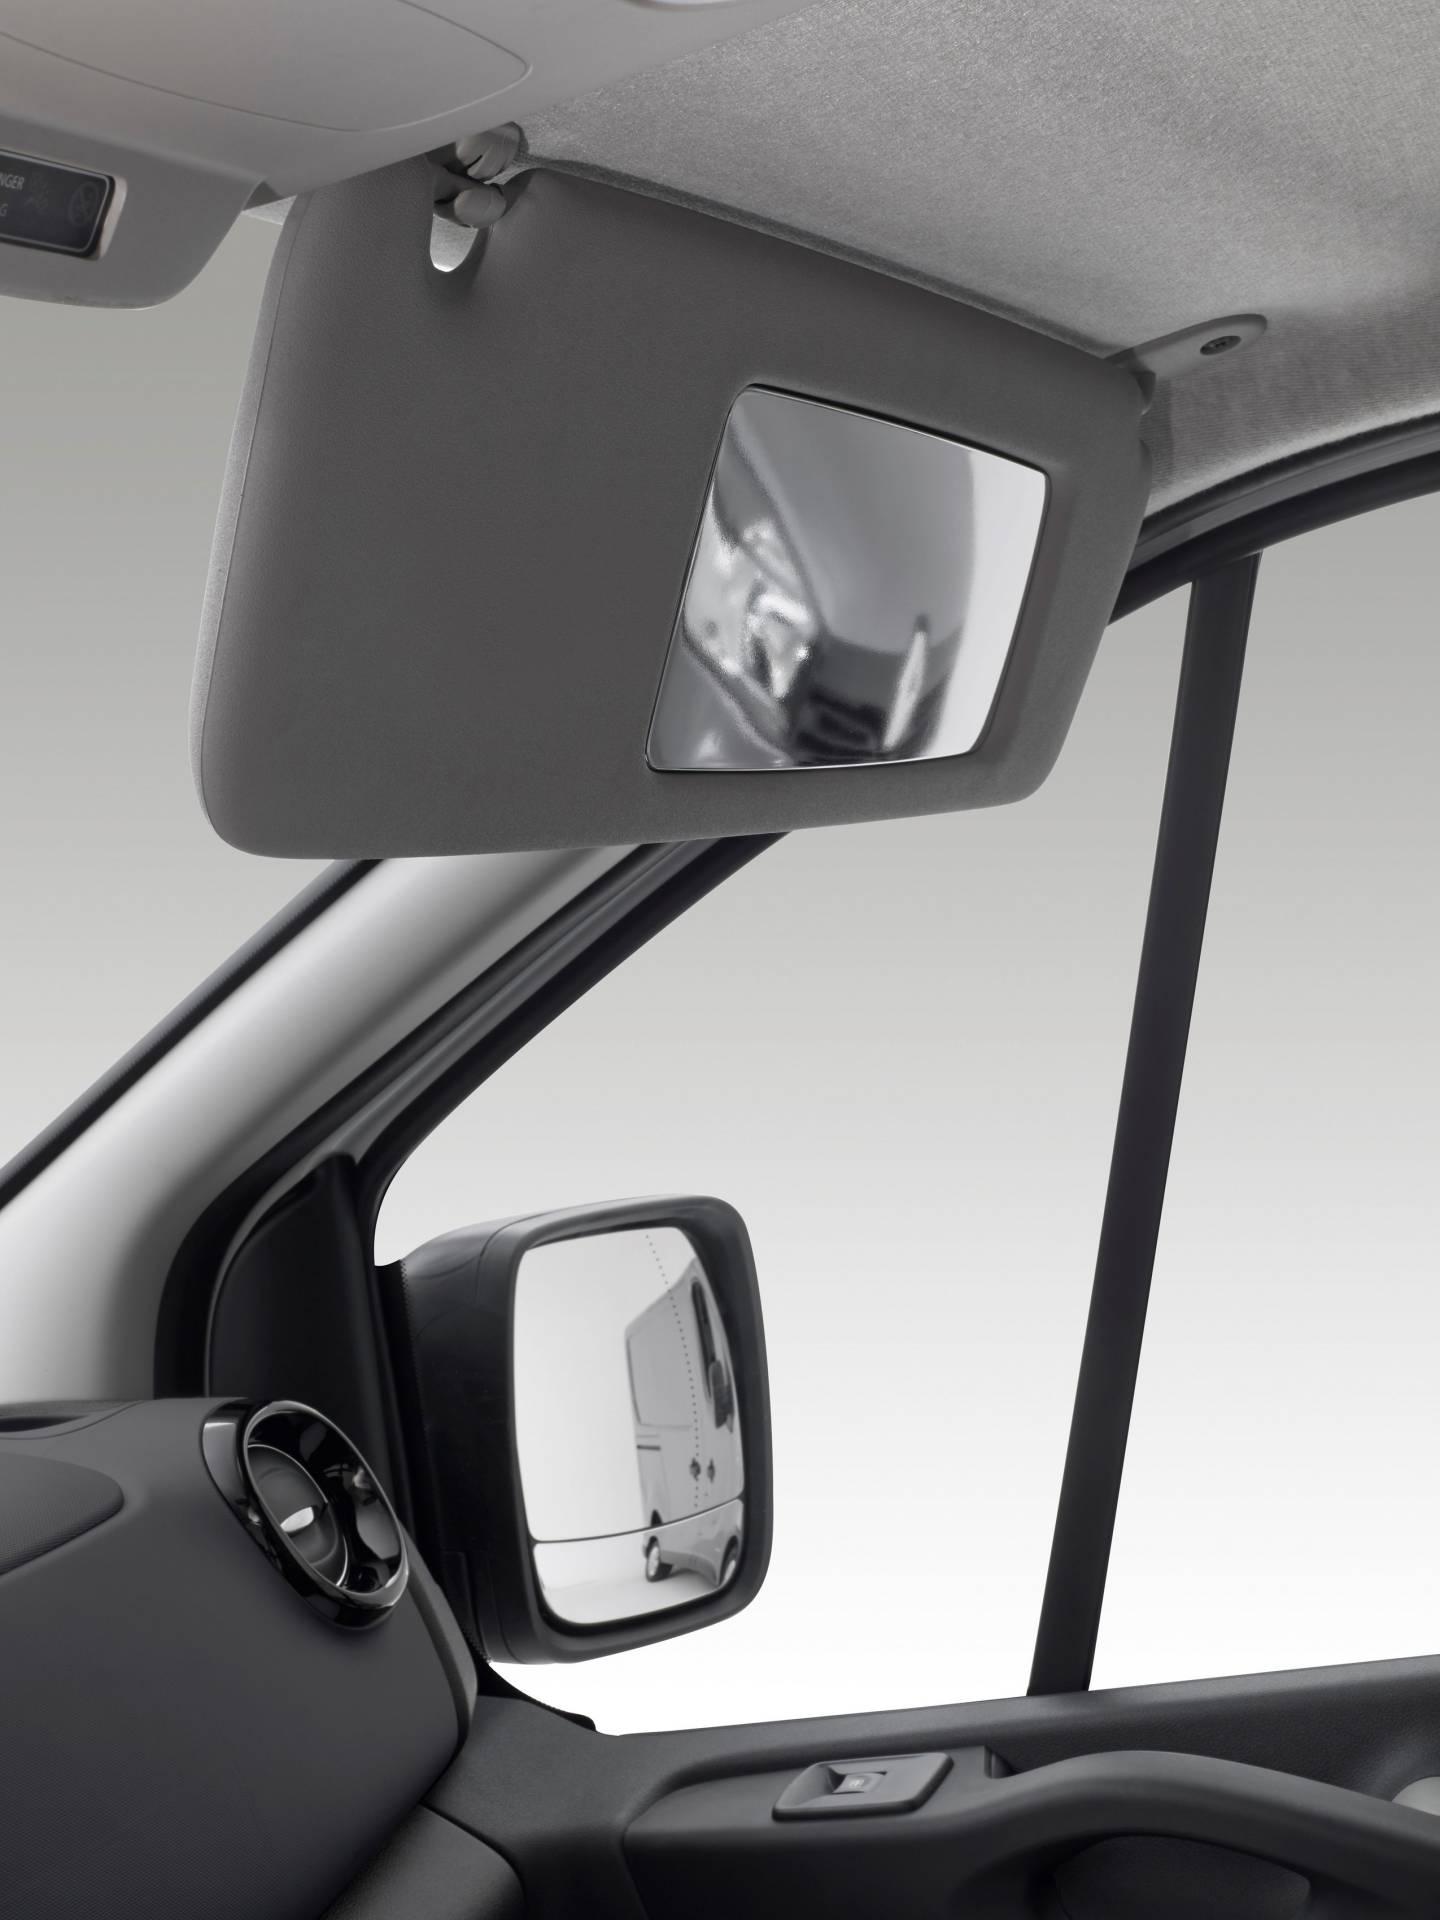 fb9e9065-2019my-renault-trafic-van-facelift-1